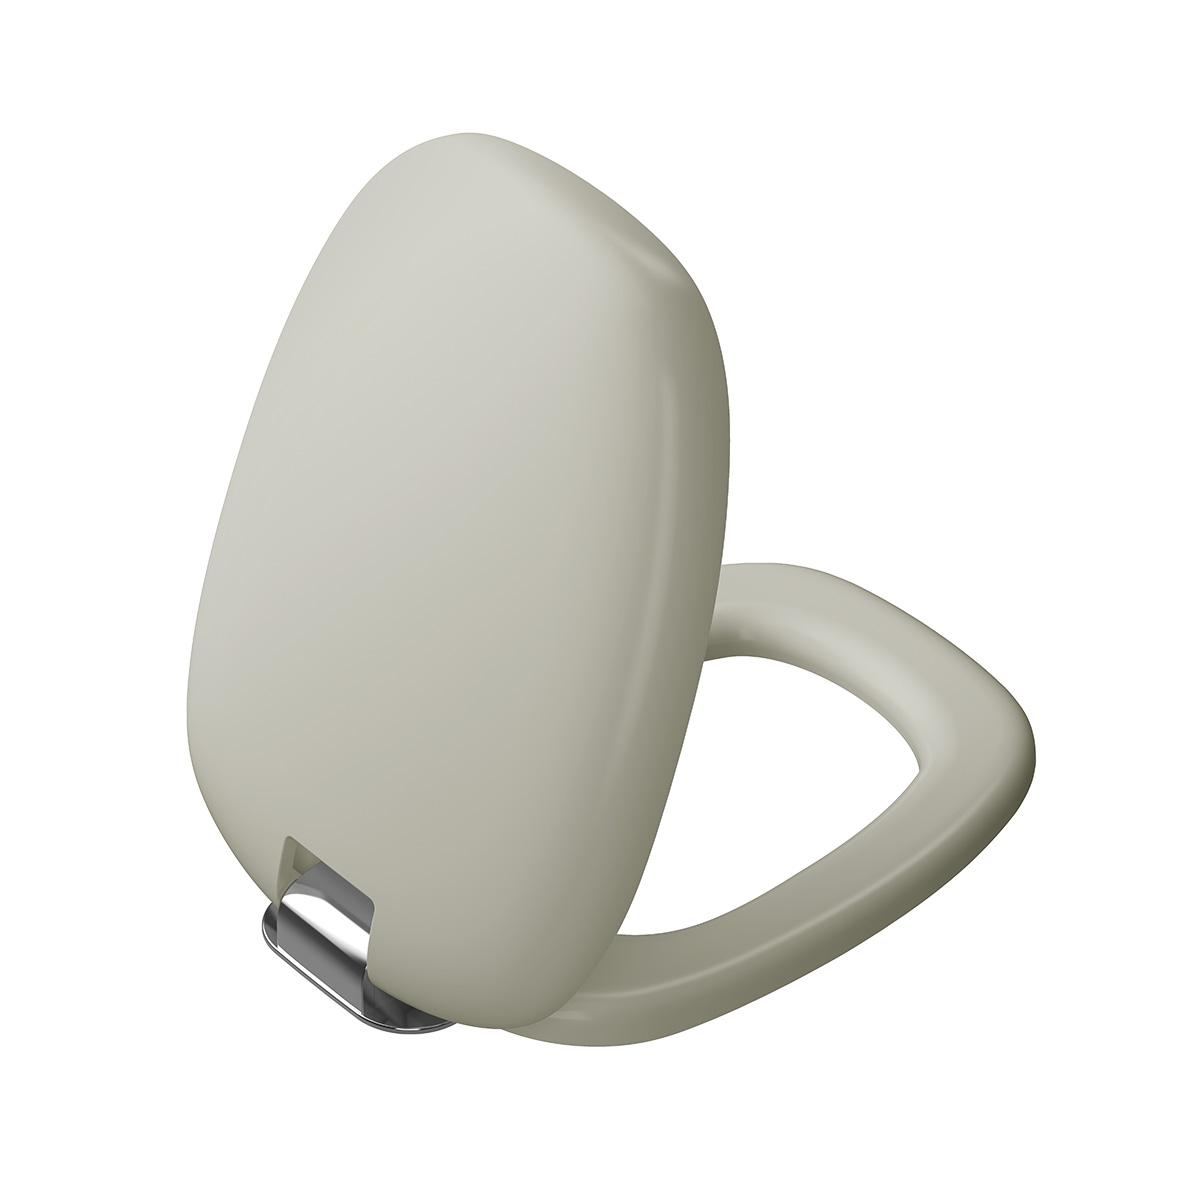 Plural WC-Sitz mit Absenkautomatik, Taupe Matt/Chrom